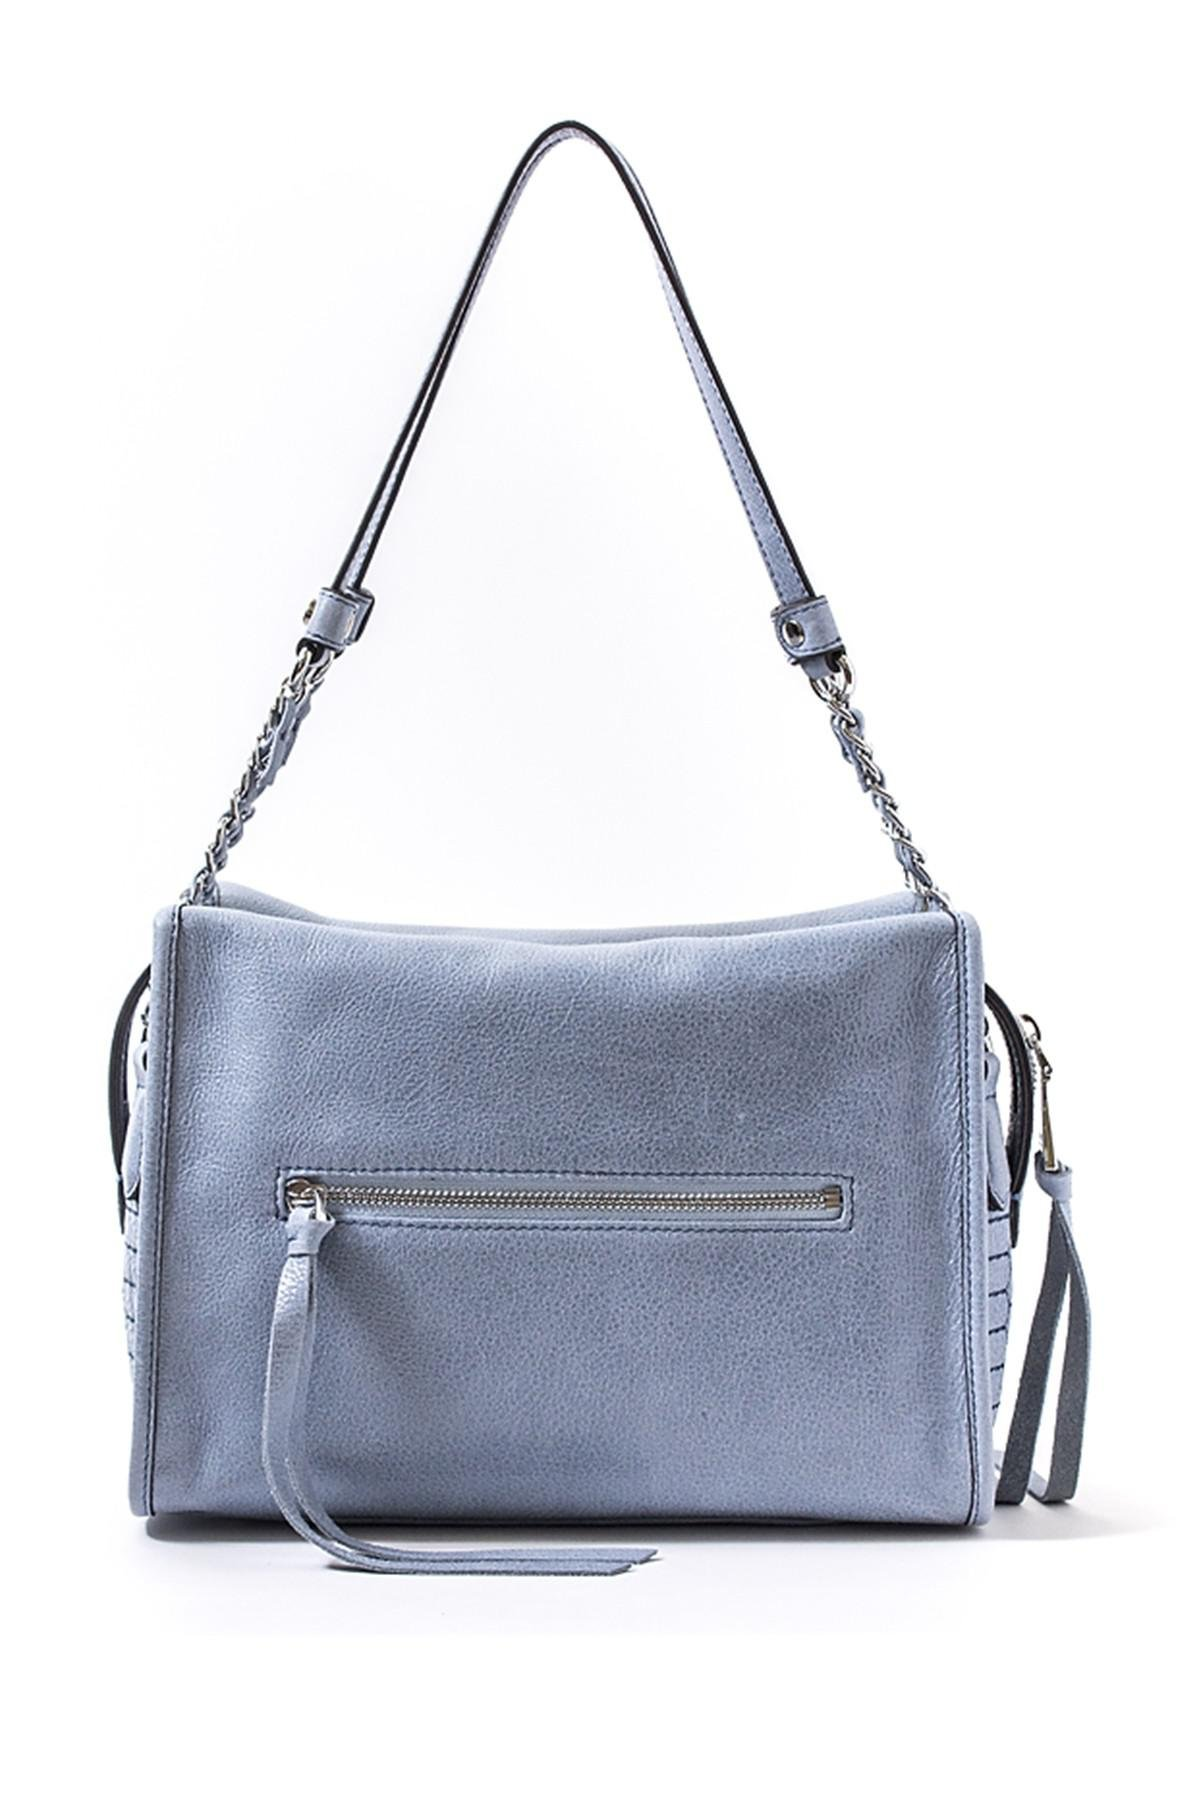 d16d70c87a Lyst - Aimee Kestenberg Leather Alexis Shoulder Bag in Blue